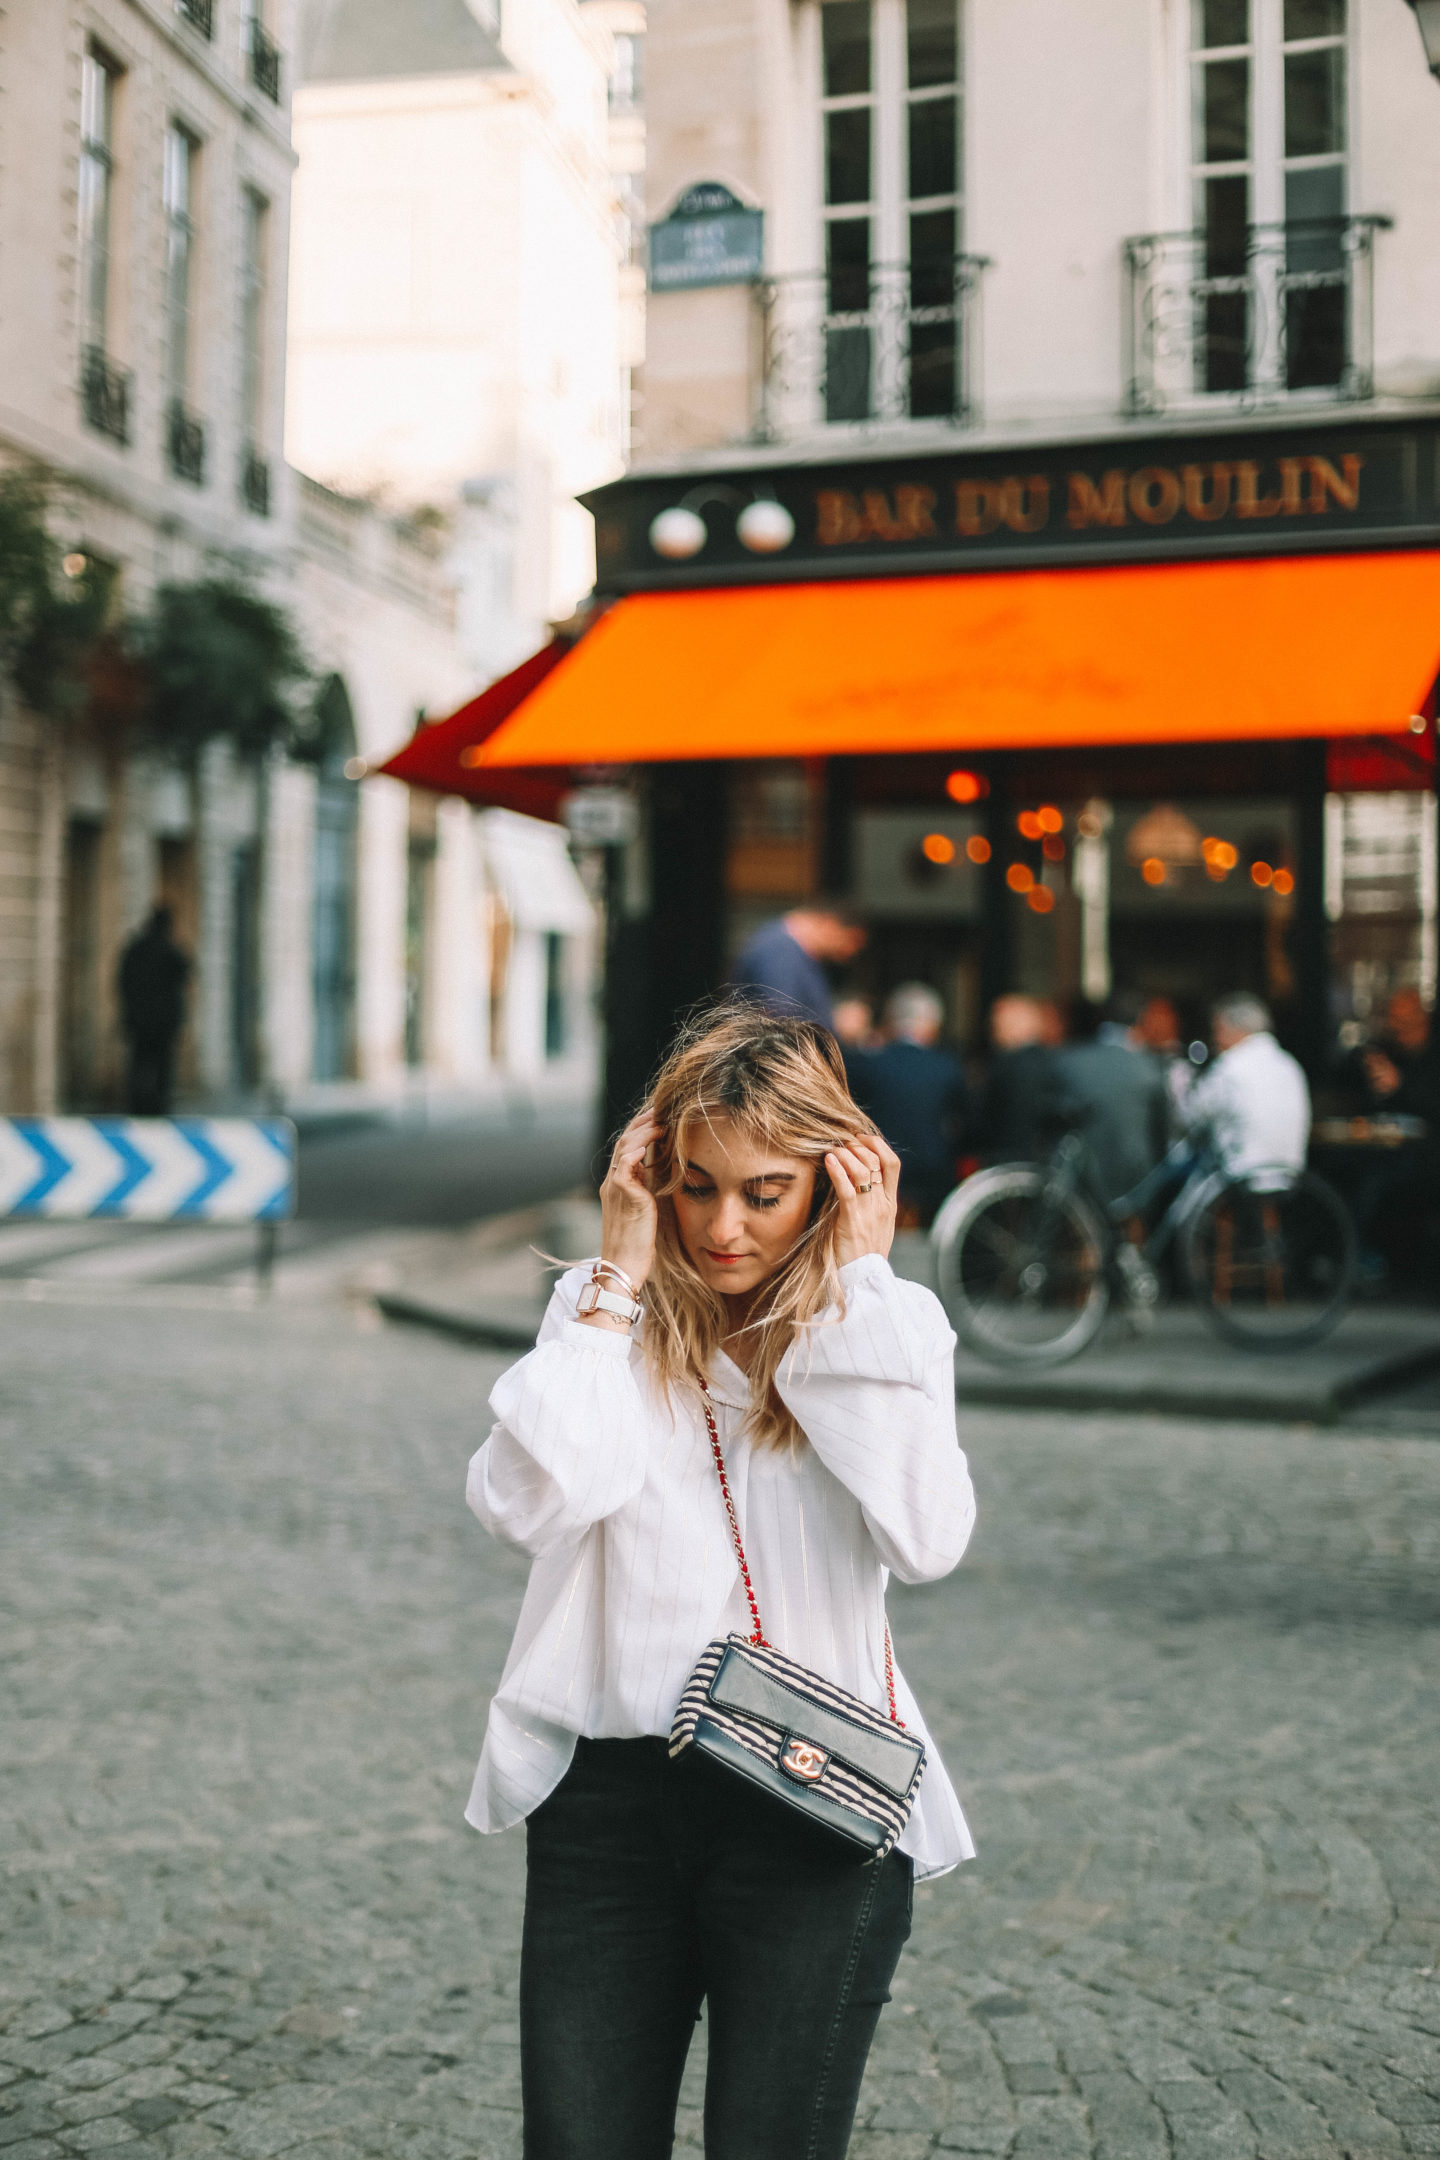 Sac Chanel - Blondie Baby blog mode Paris et voyages